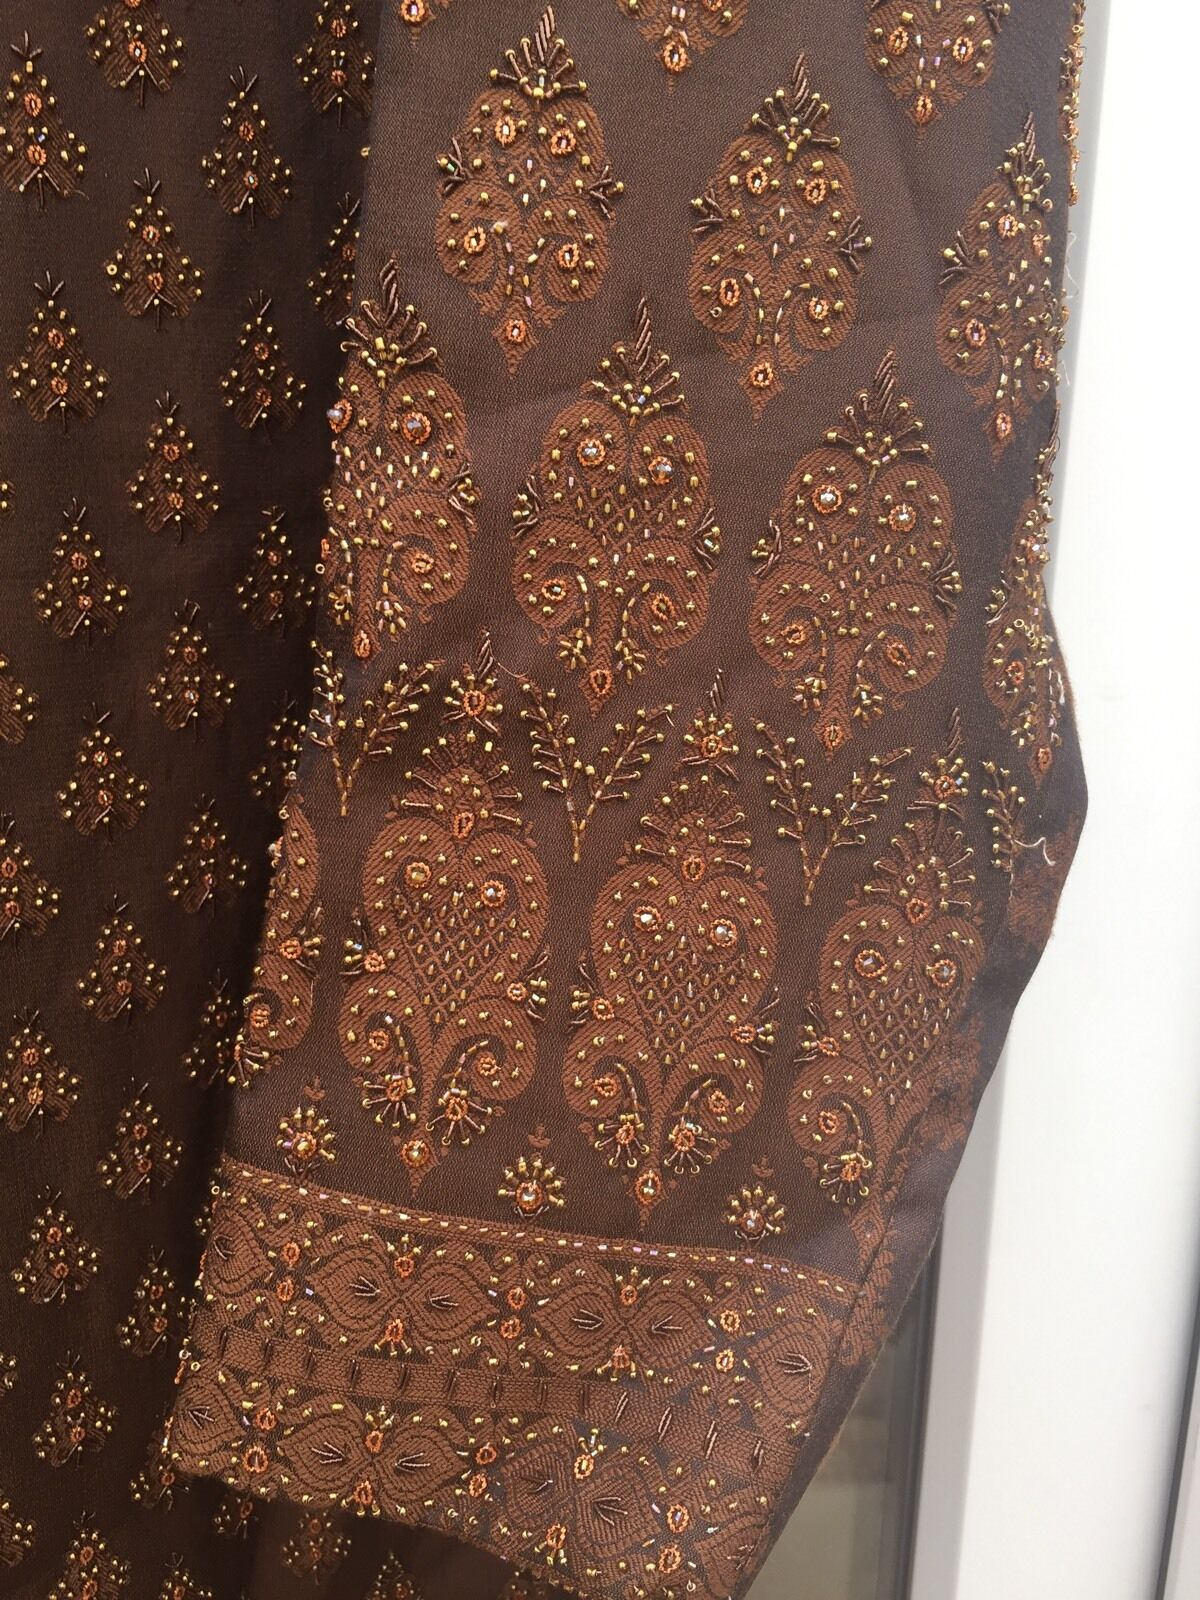 Mens Wedding Sherwani Long Coat Embroidery Elegant .